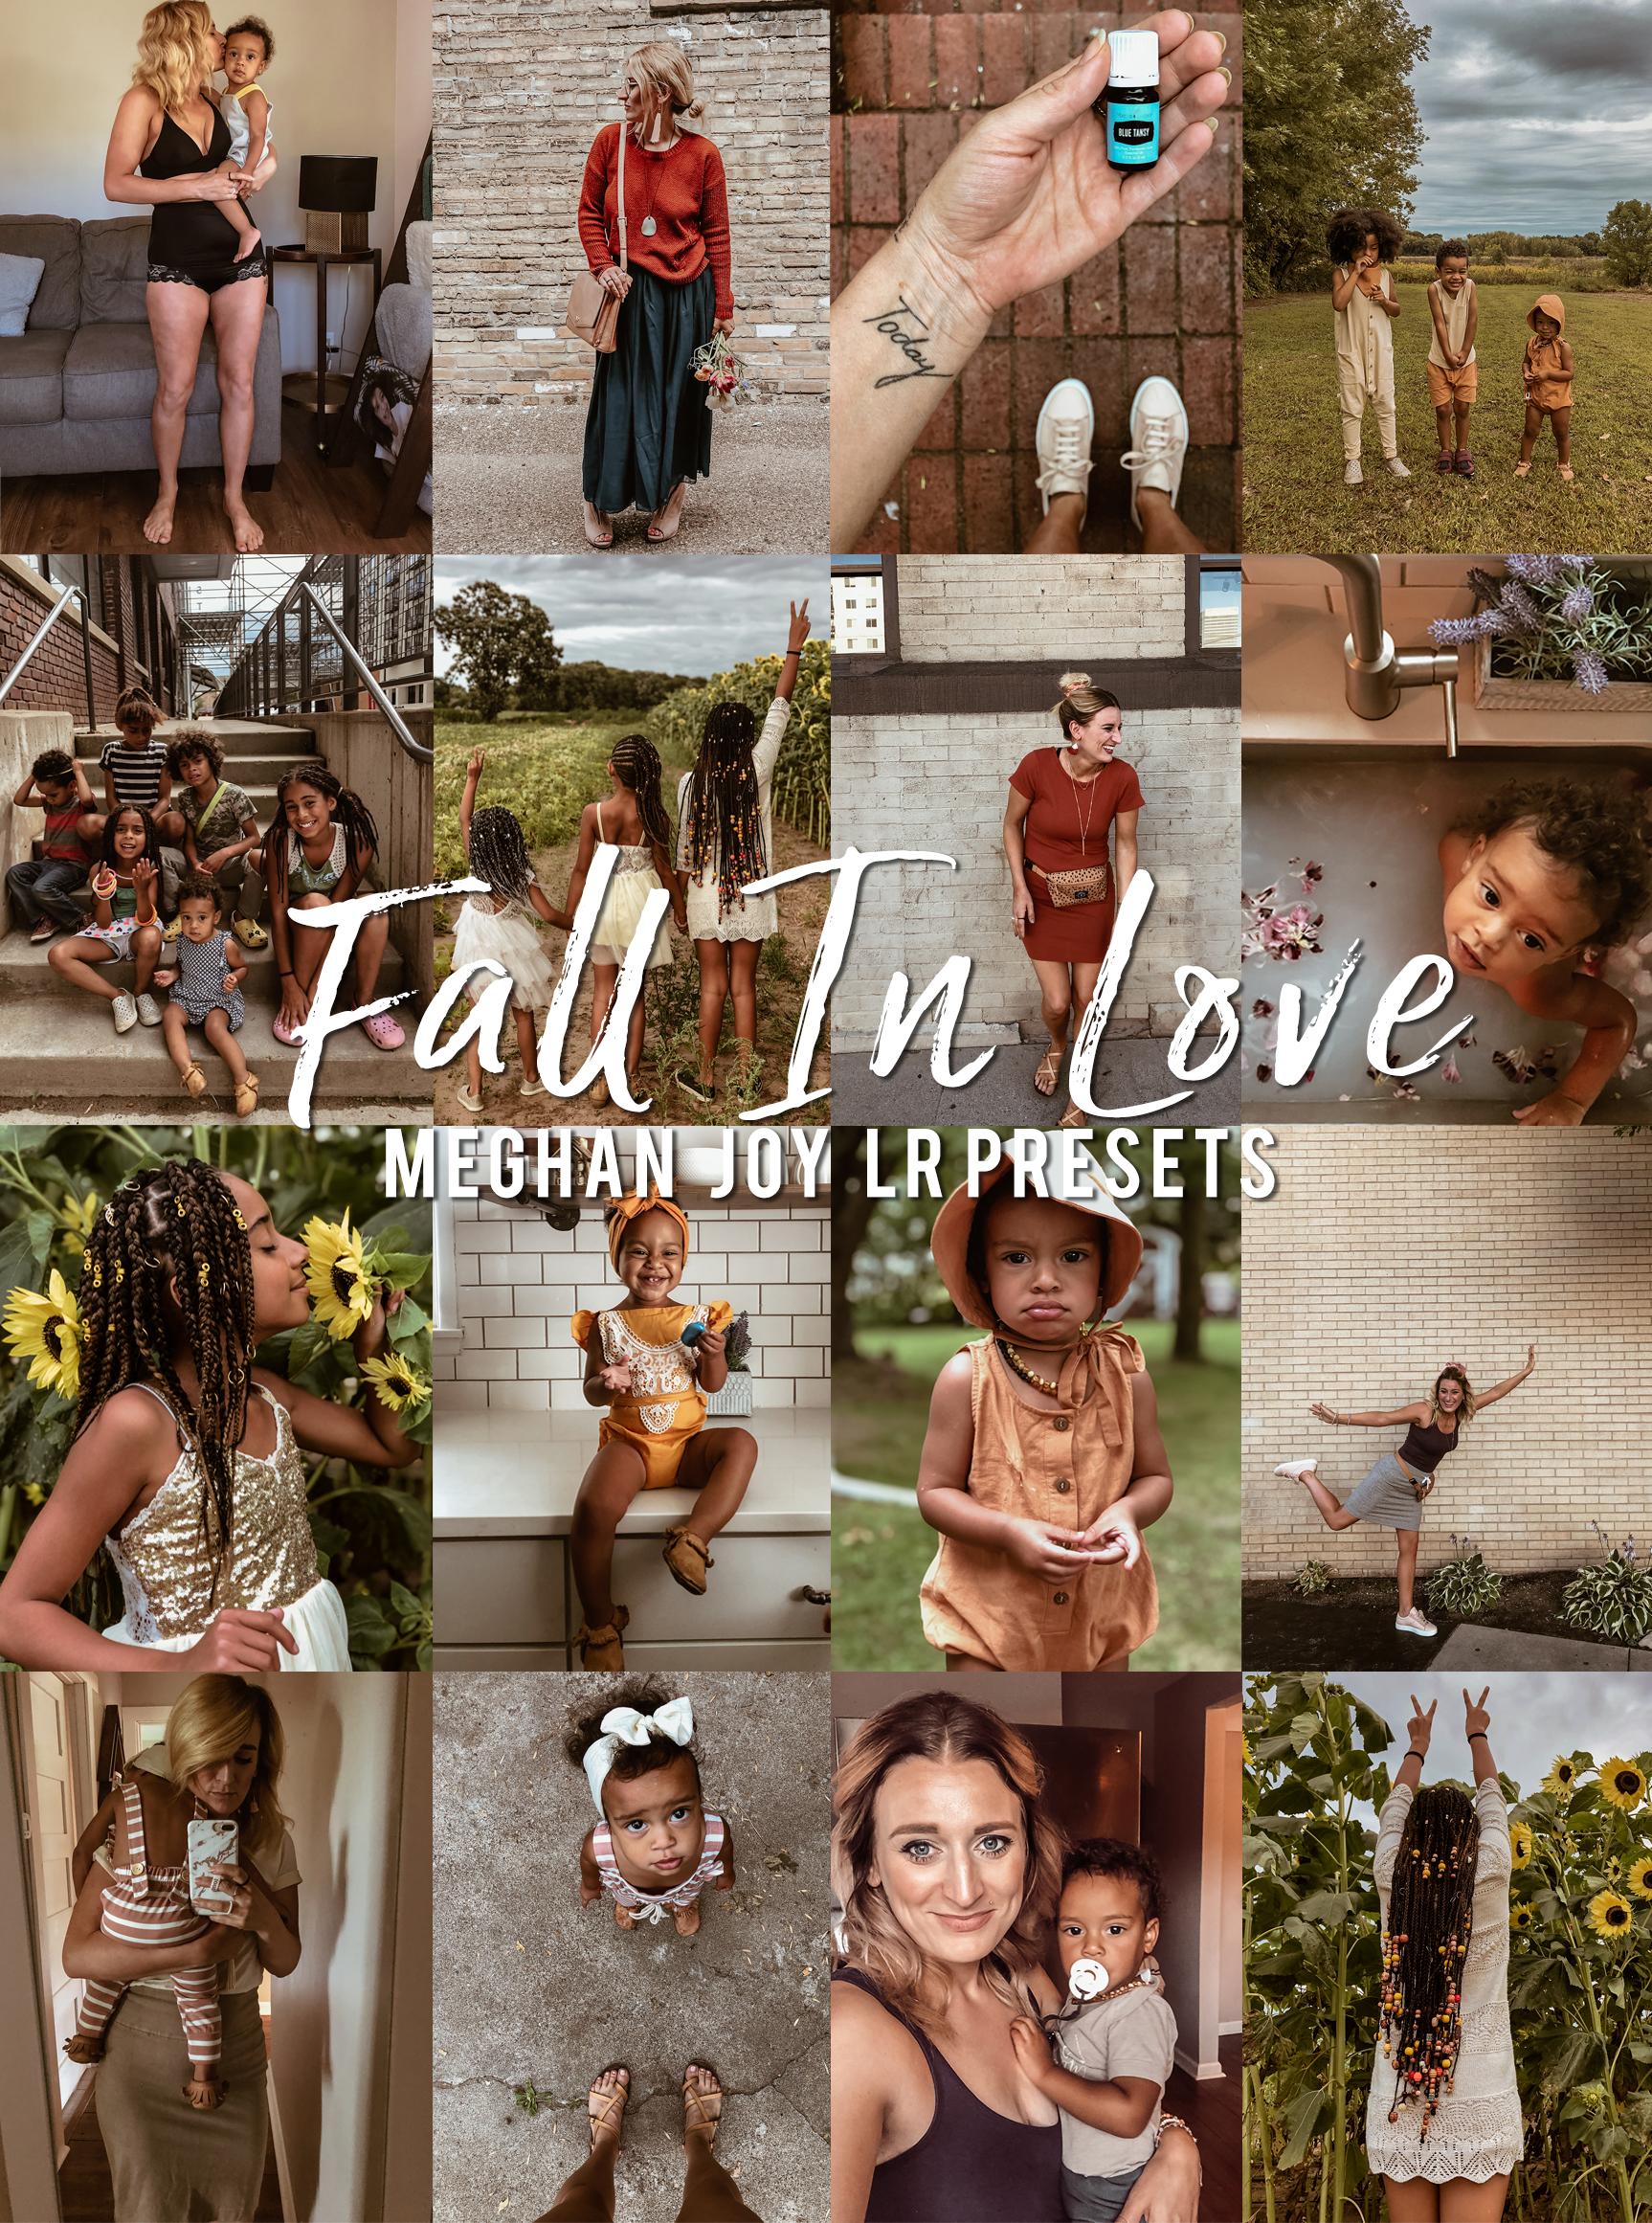 Fall-In-Love-Cover.JPG